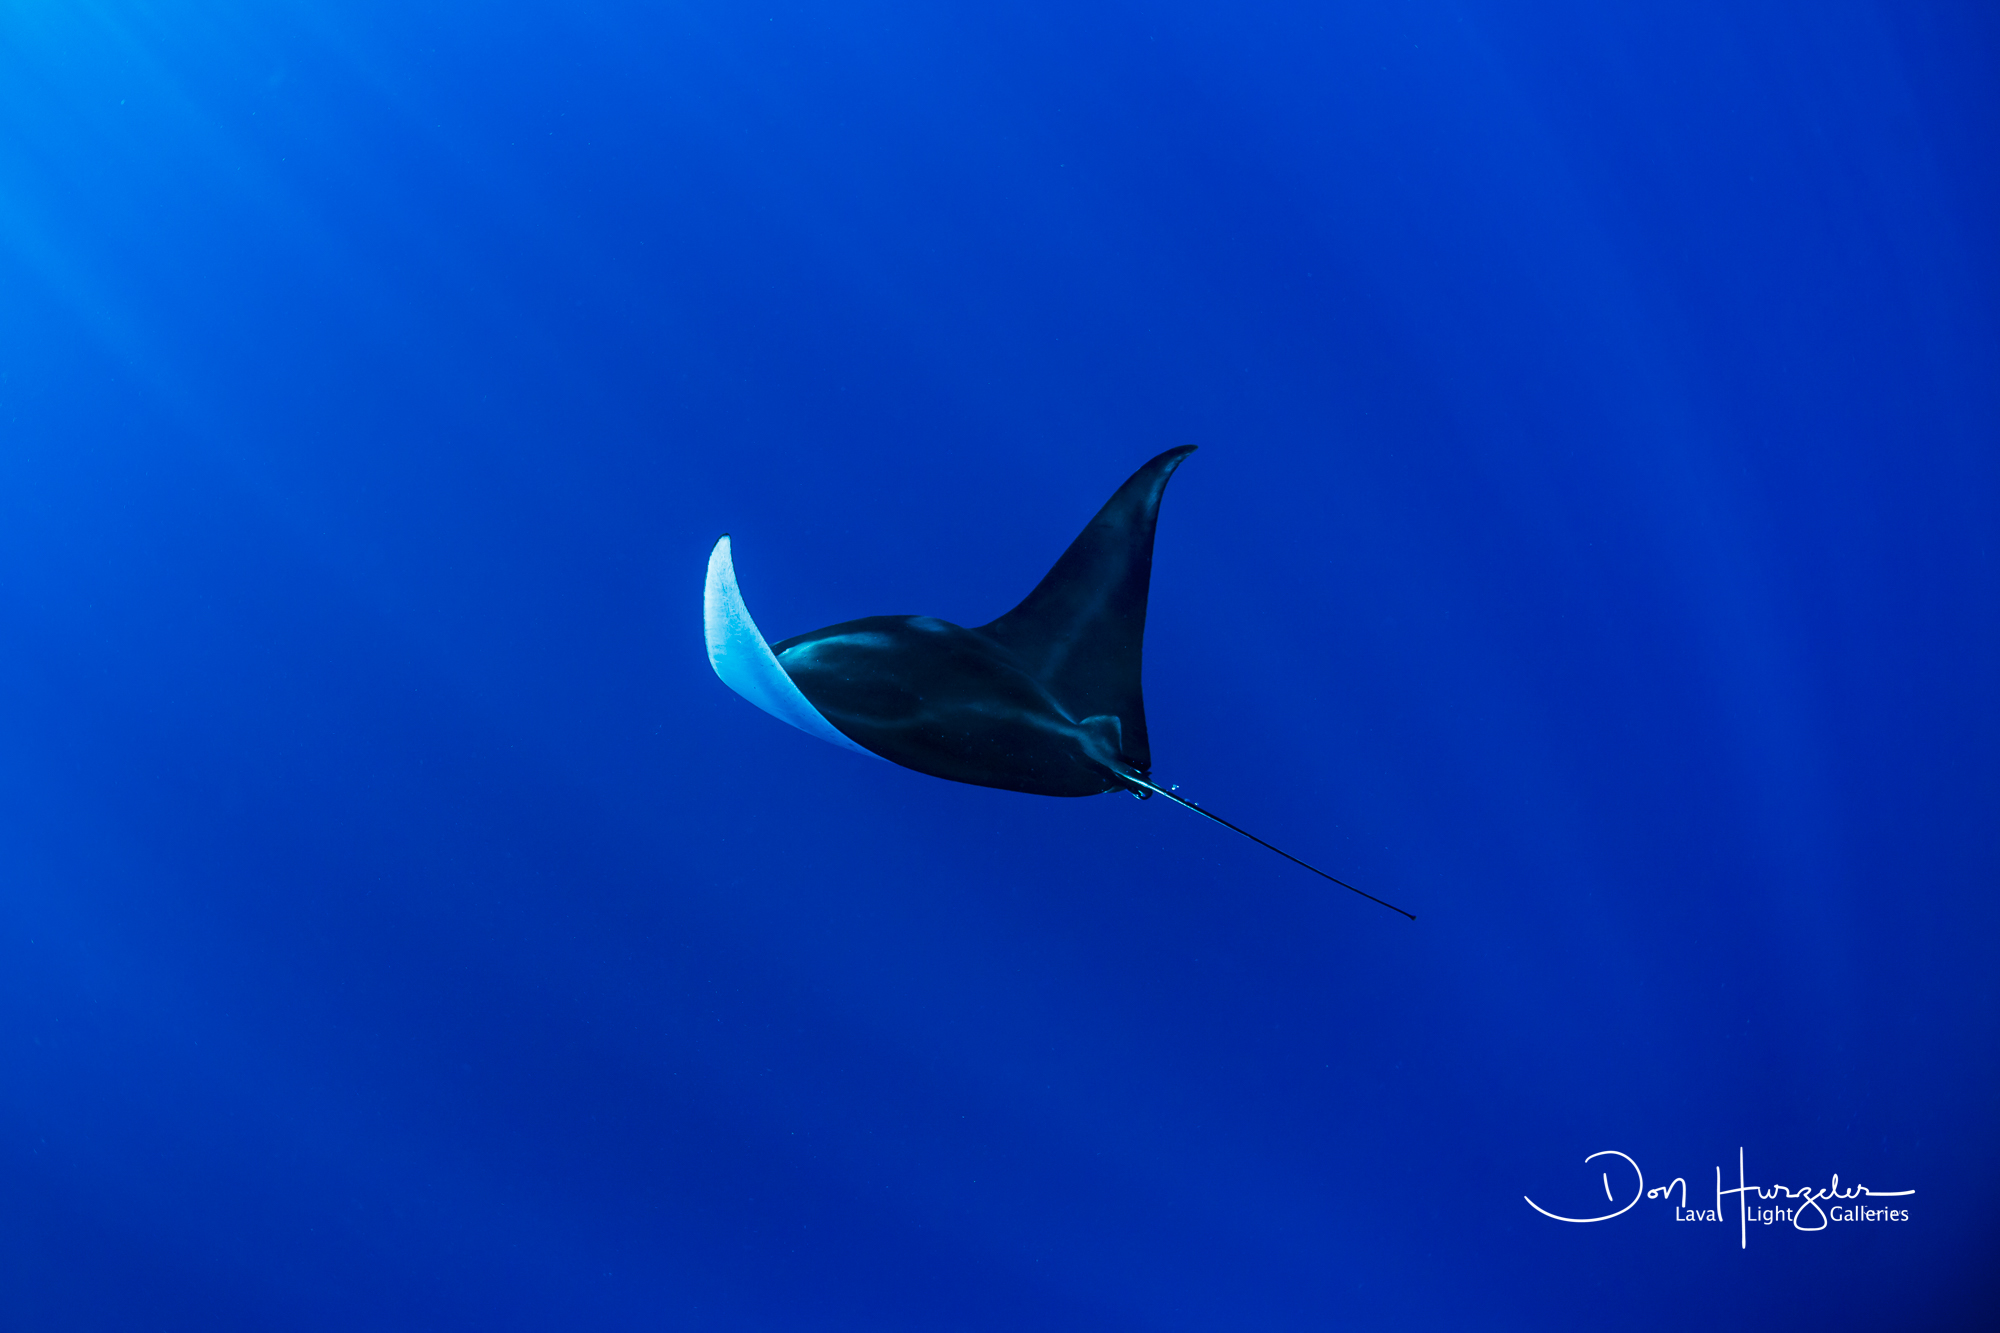 Manta flying over the depths.